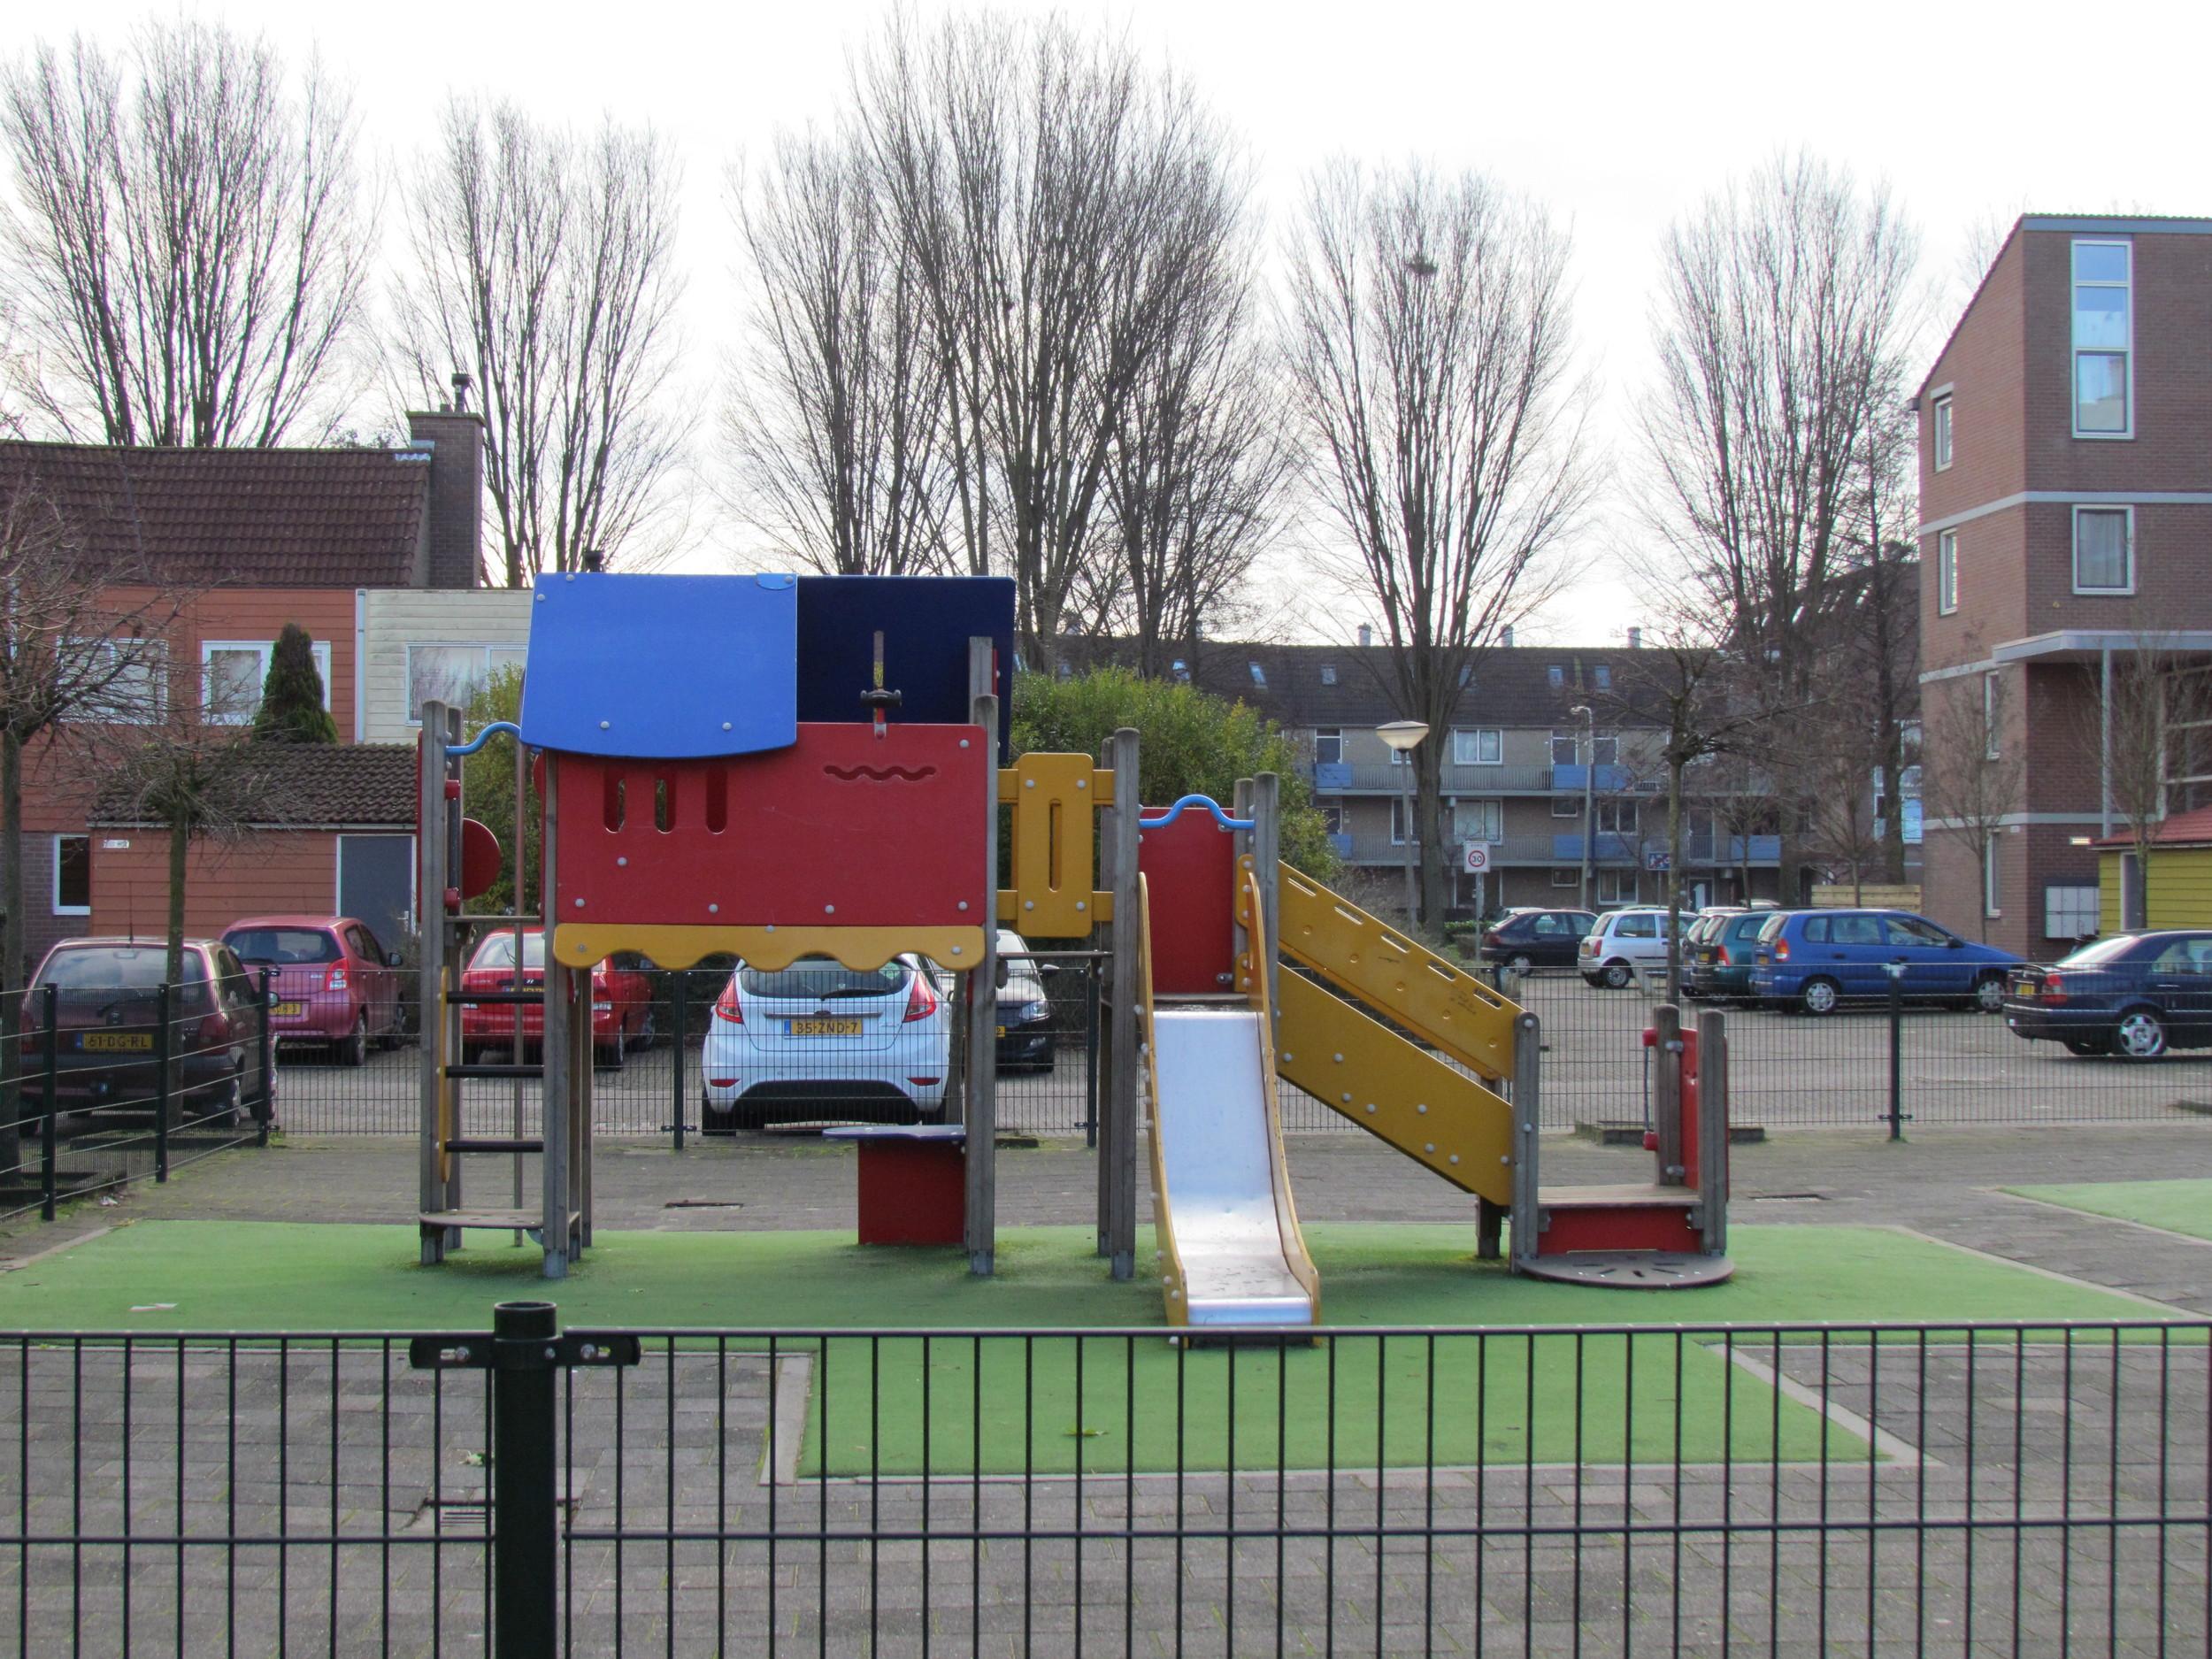 The playground looks a bit fancier now